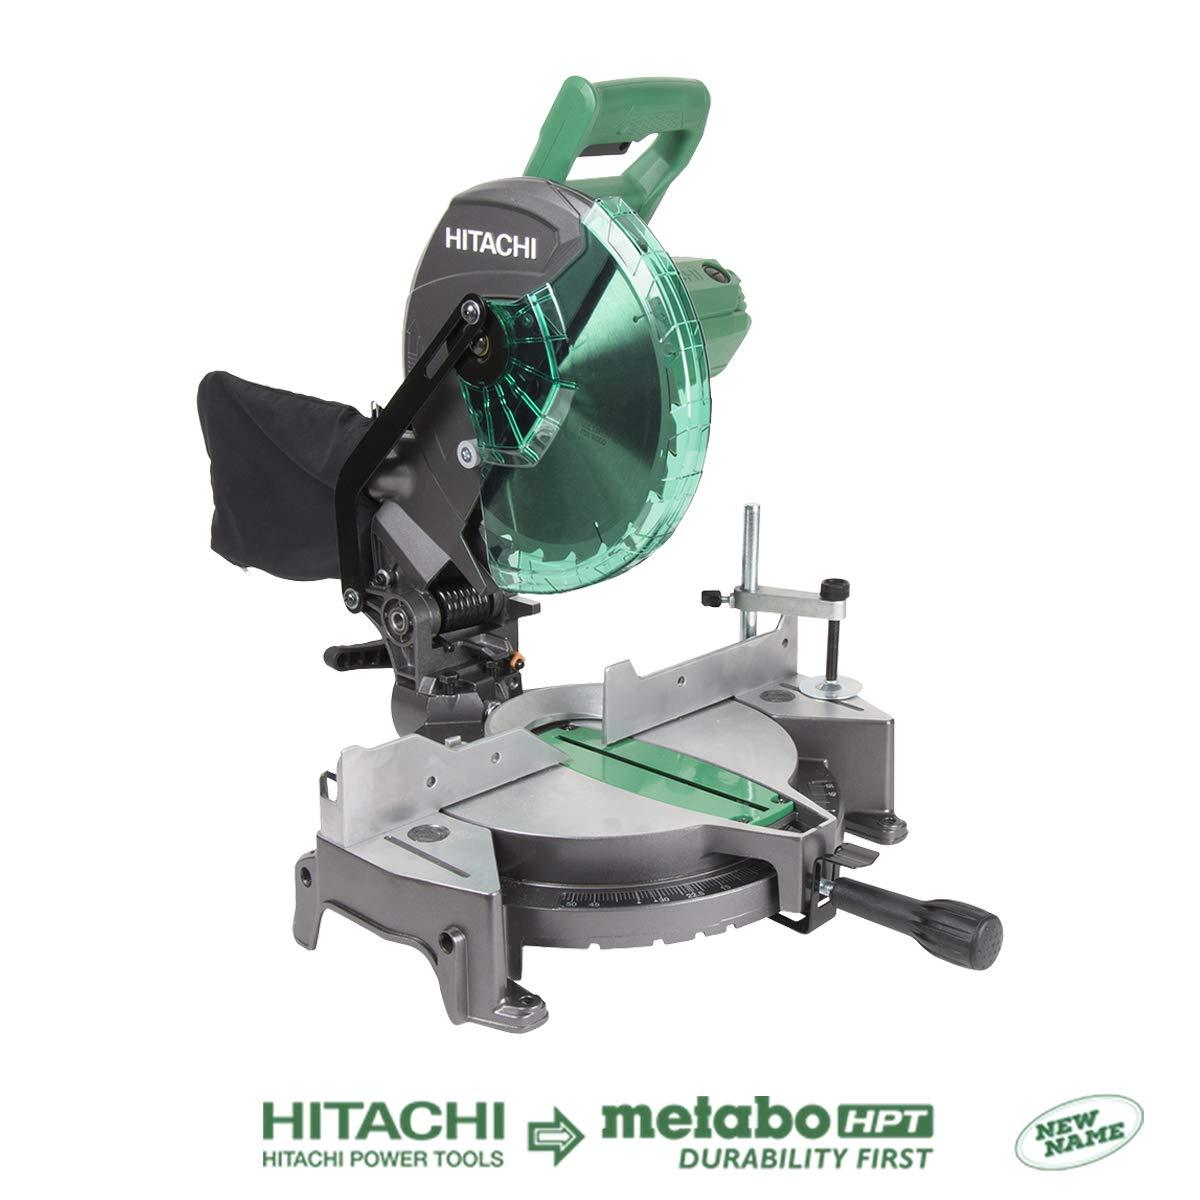 Amazon.com: Hitachi Single Bevel Compound: Home Improvement